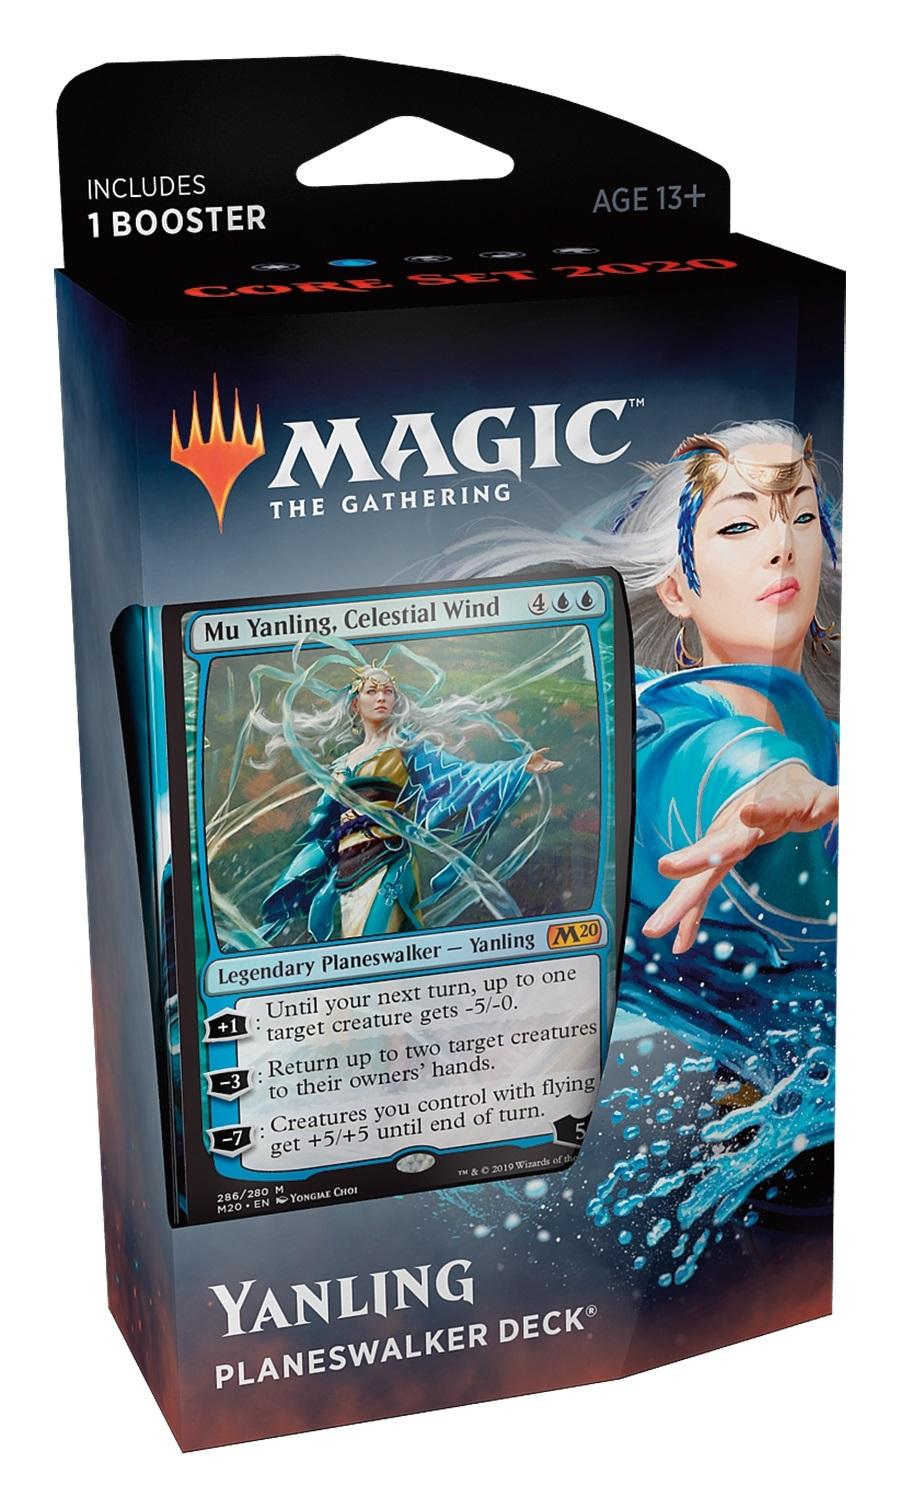 Magic The Gathering: Core Set 2020 Yanling Planeswalker Deck image